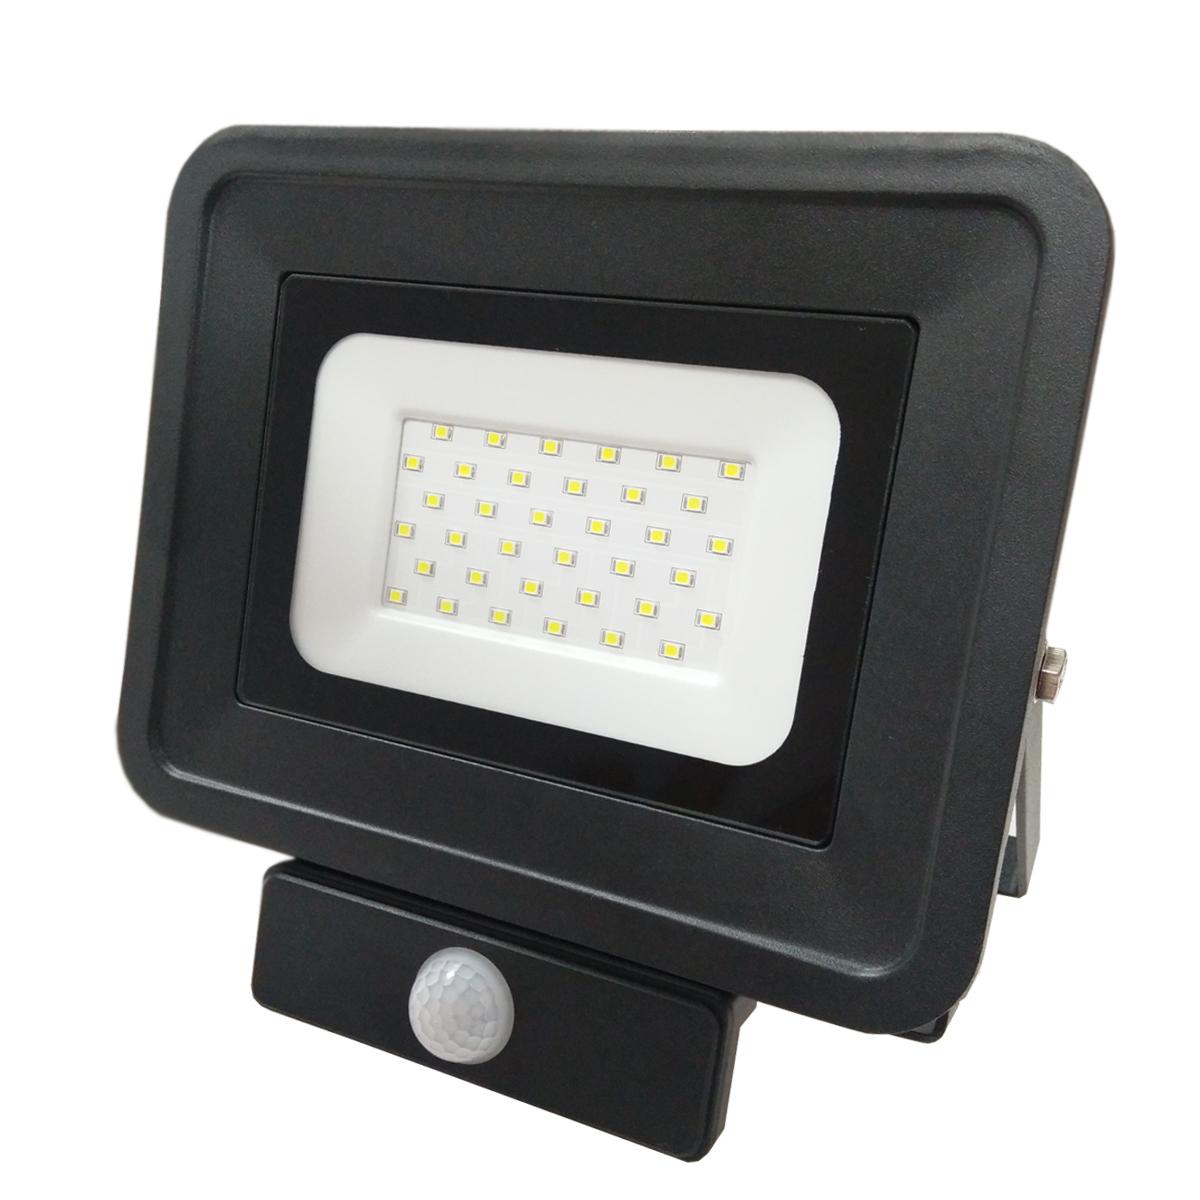 LED venkovní reflektor SMD Classic2 PIR černý 50W neutrální bílá